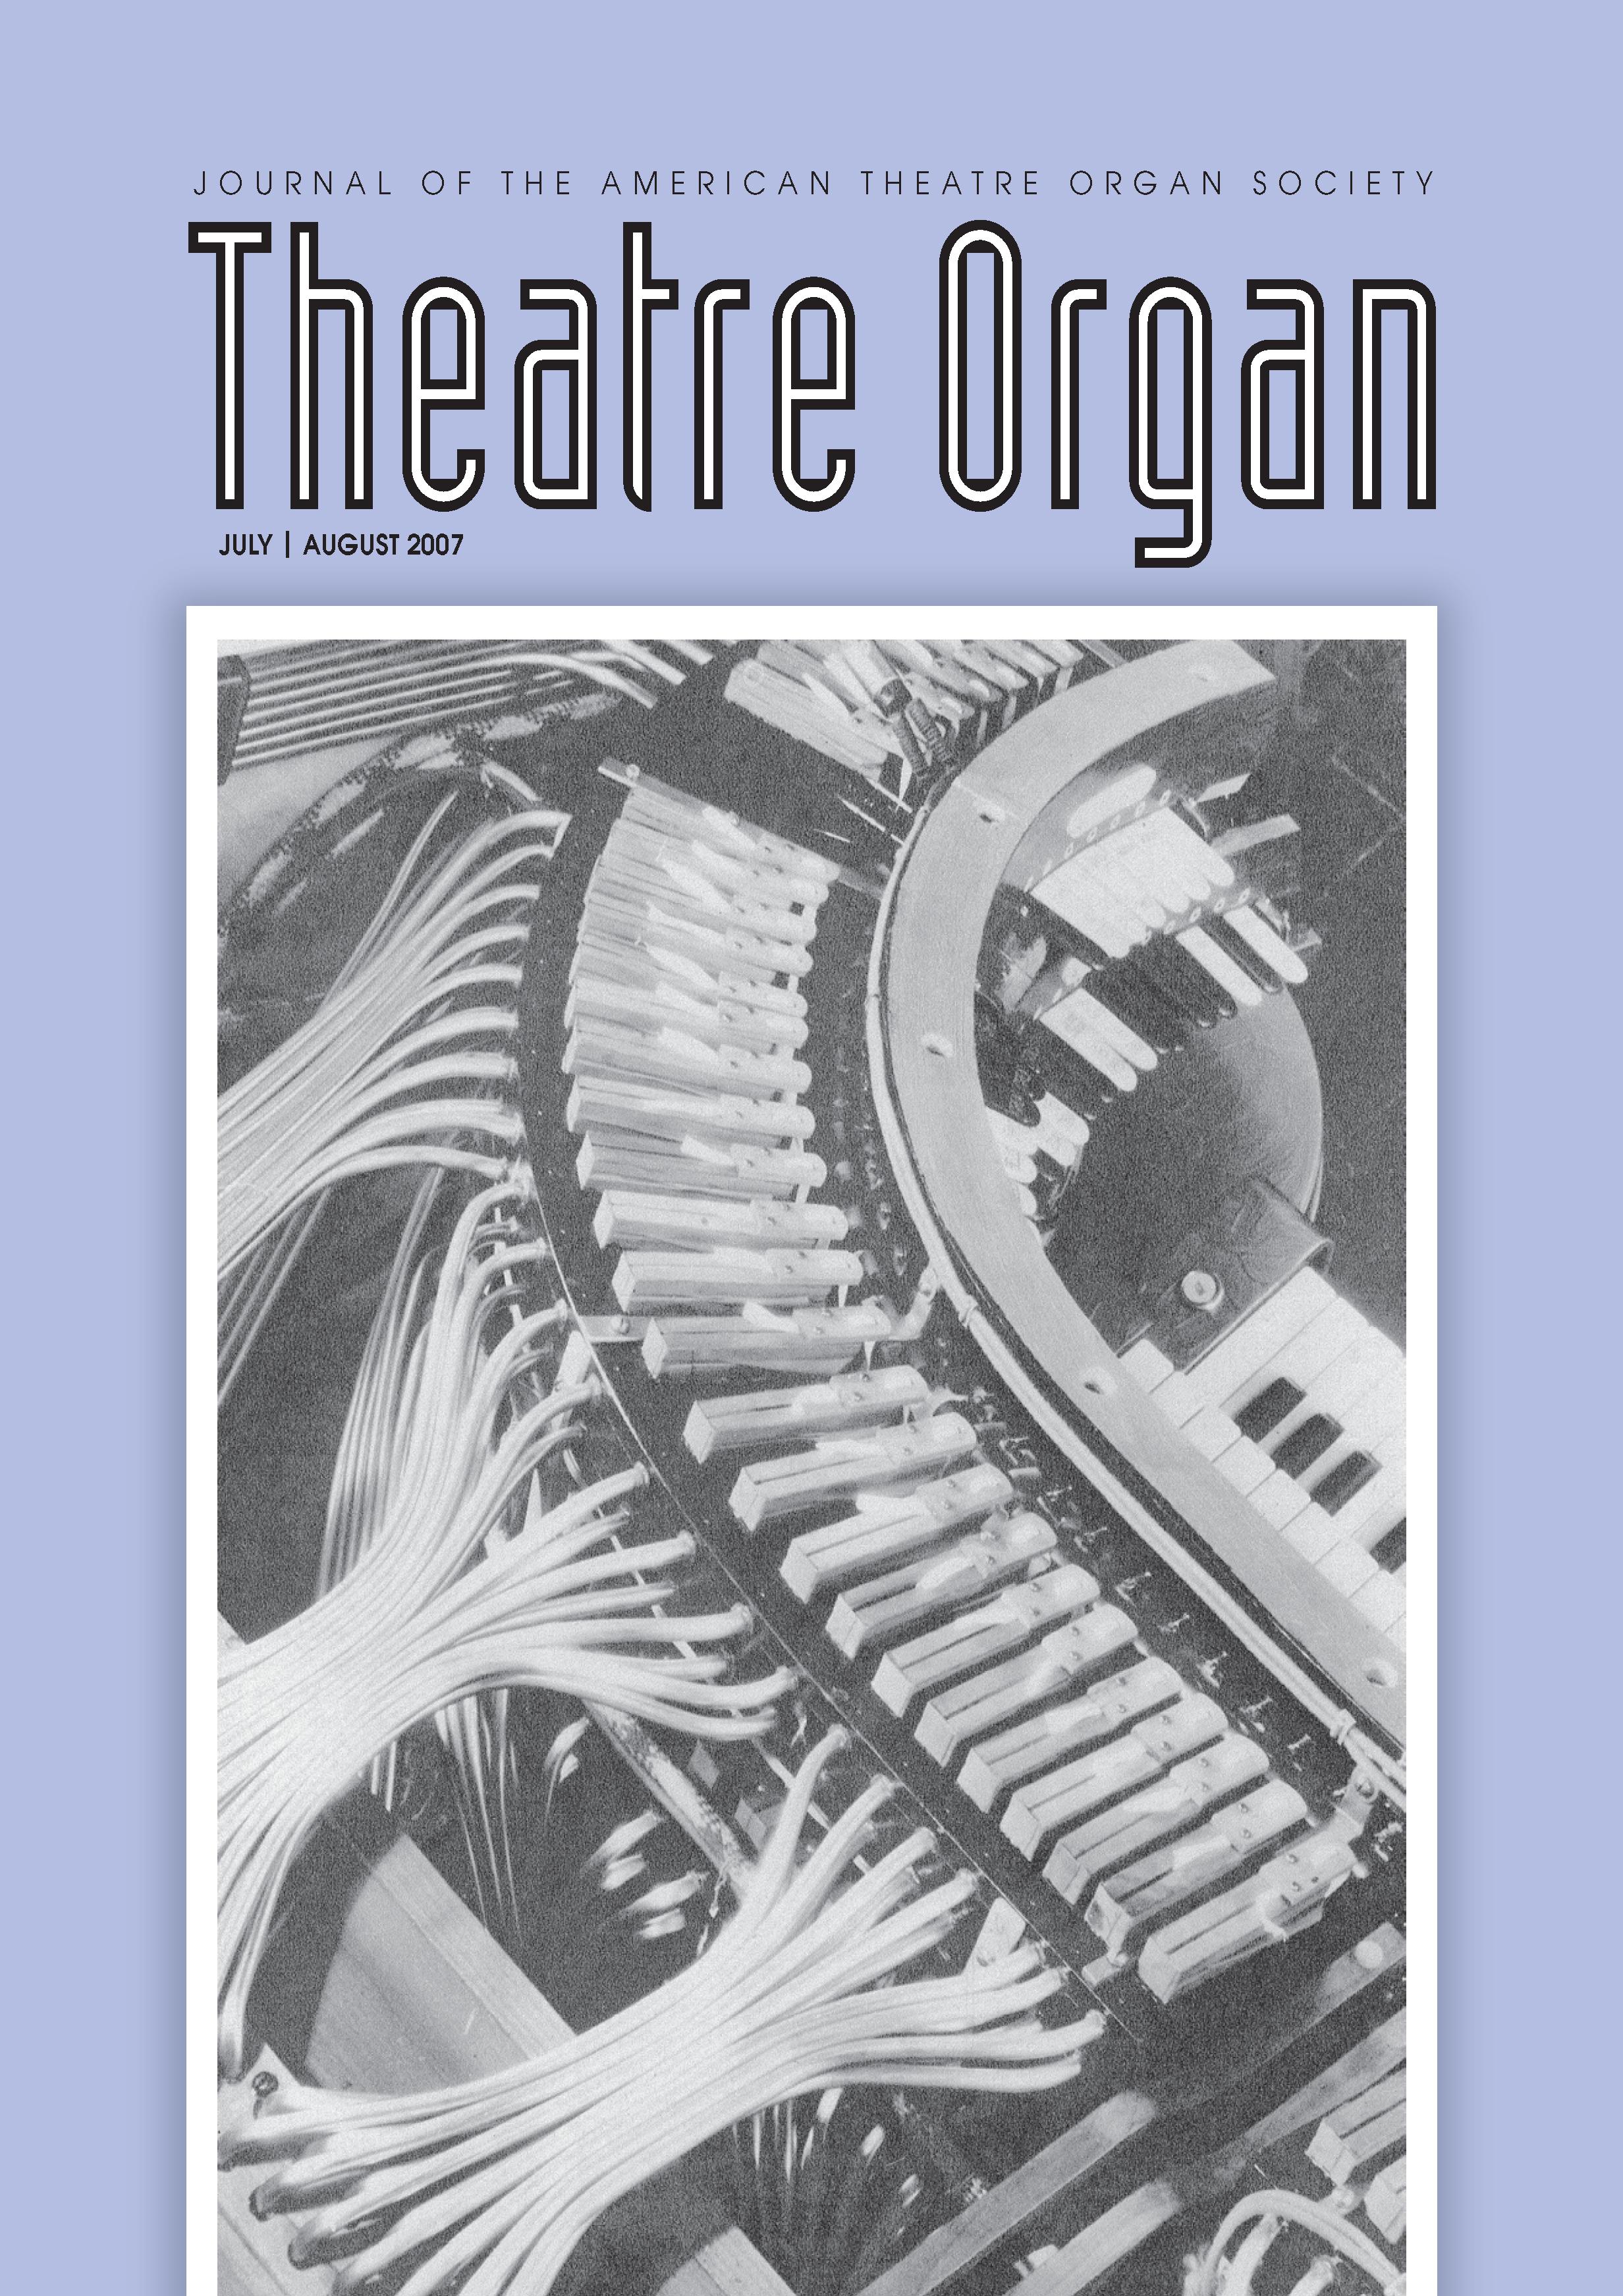 Theatre Organ, July - August 2007, Volume 49, Number 4